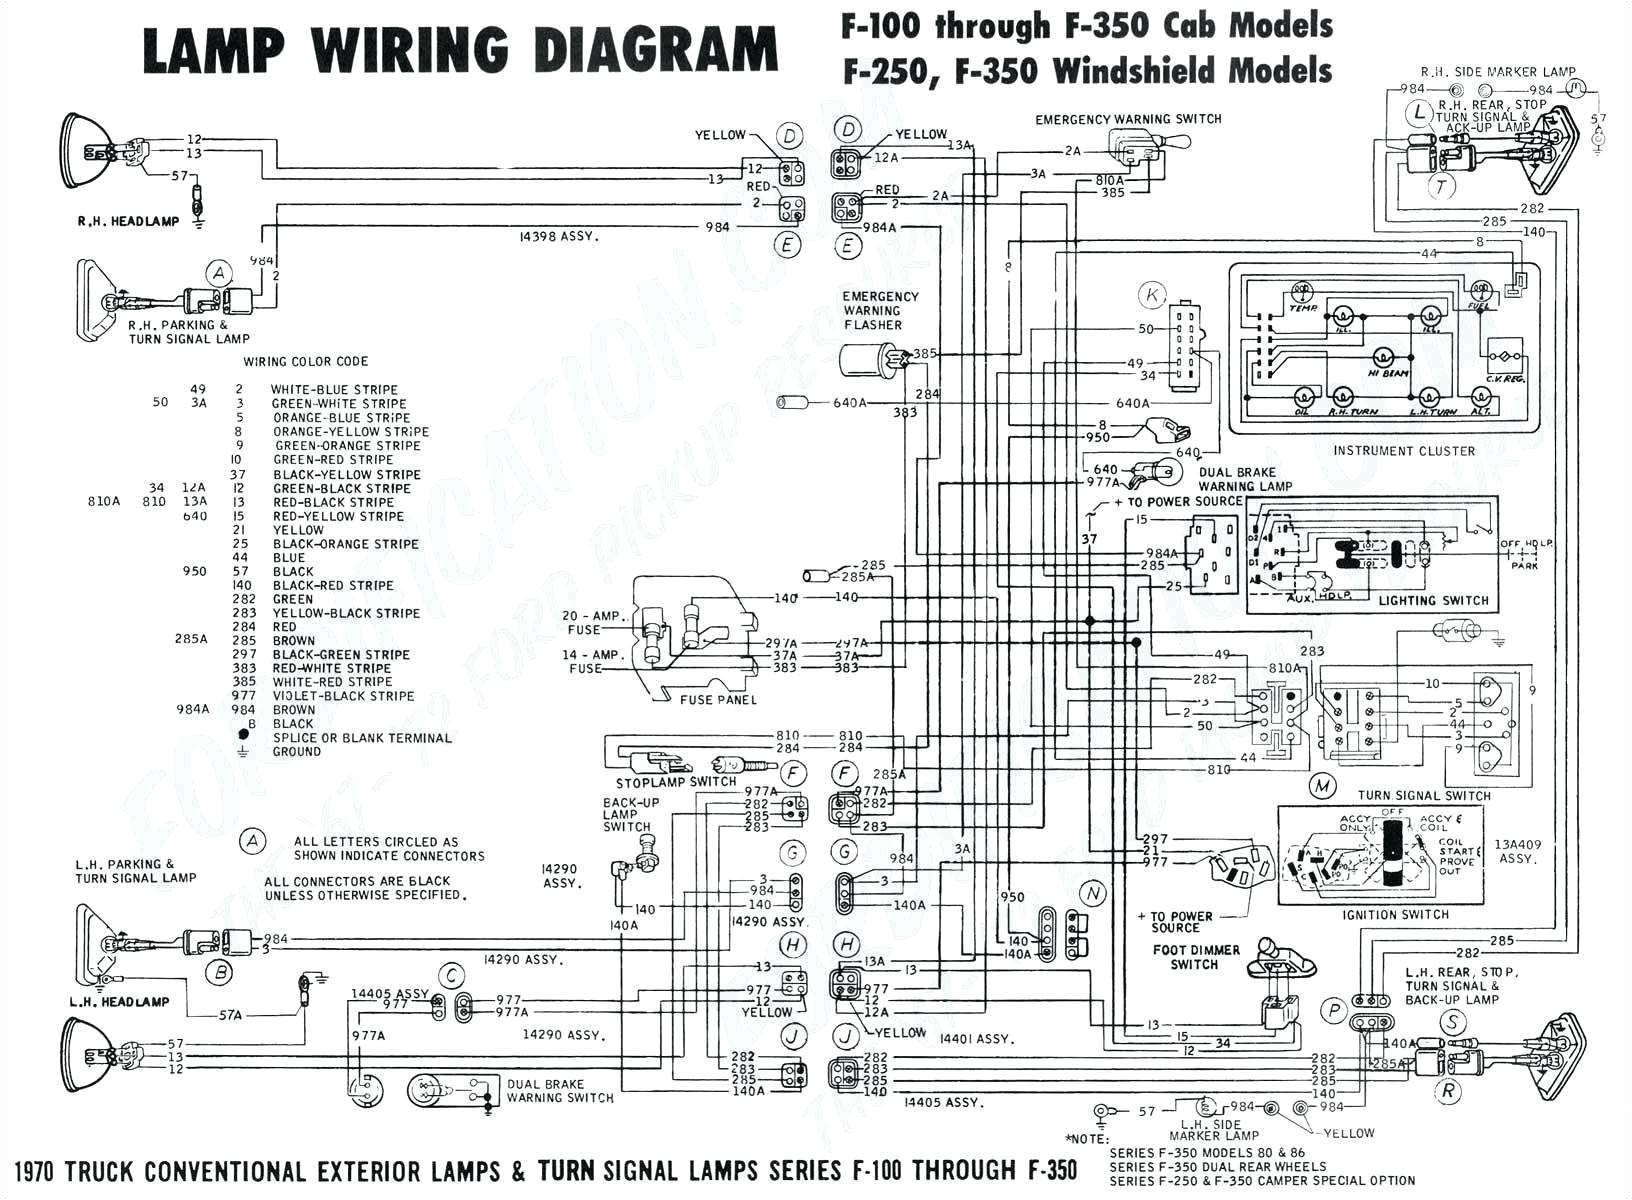 1999 dodge ram fuse box diagram wiring diagram ame 2000 dodge ram v1 0 fuse box diagram